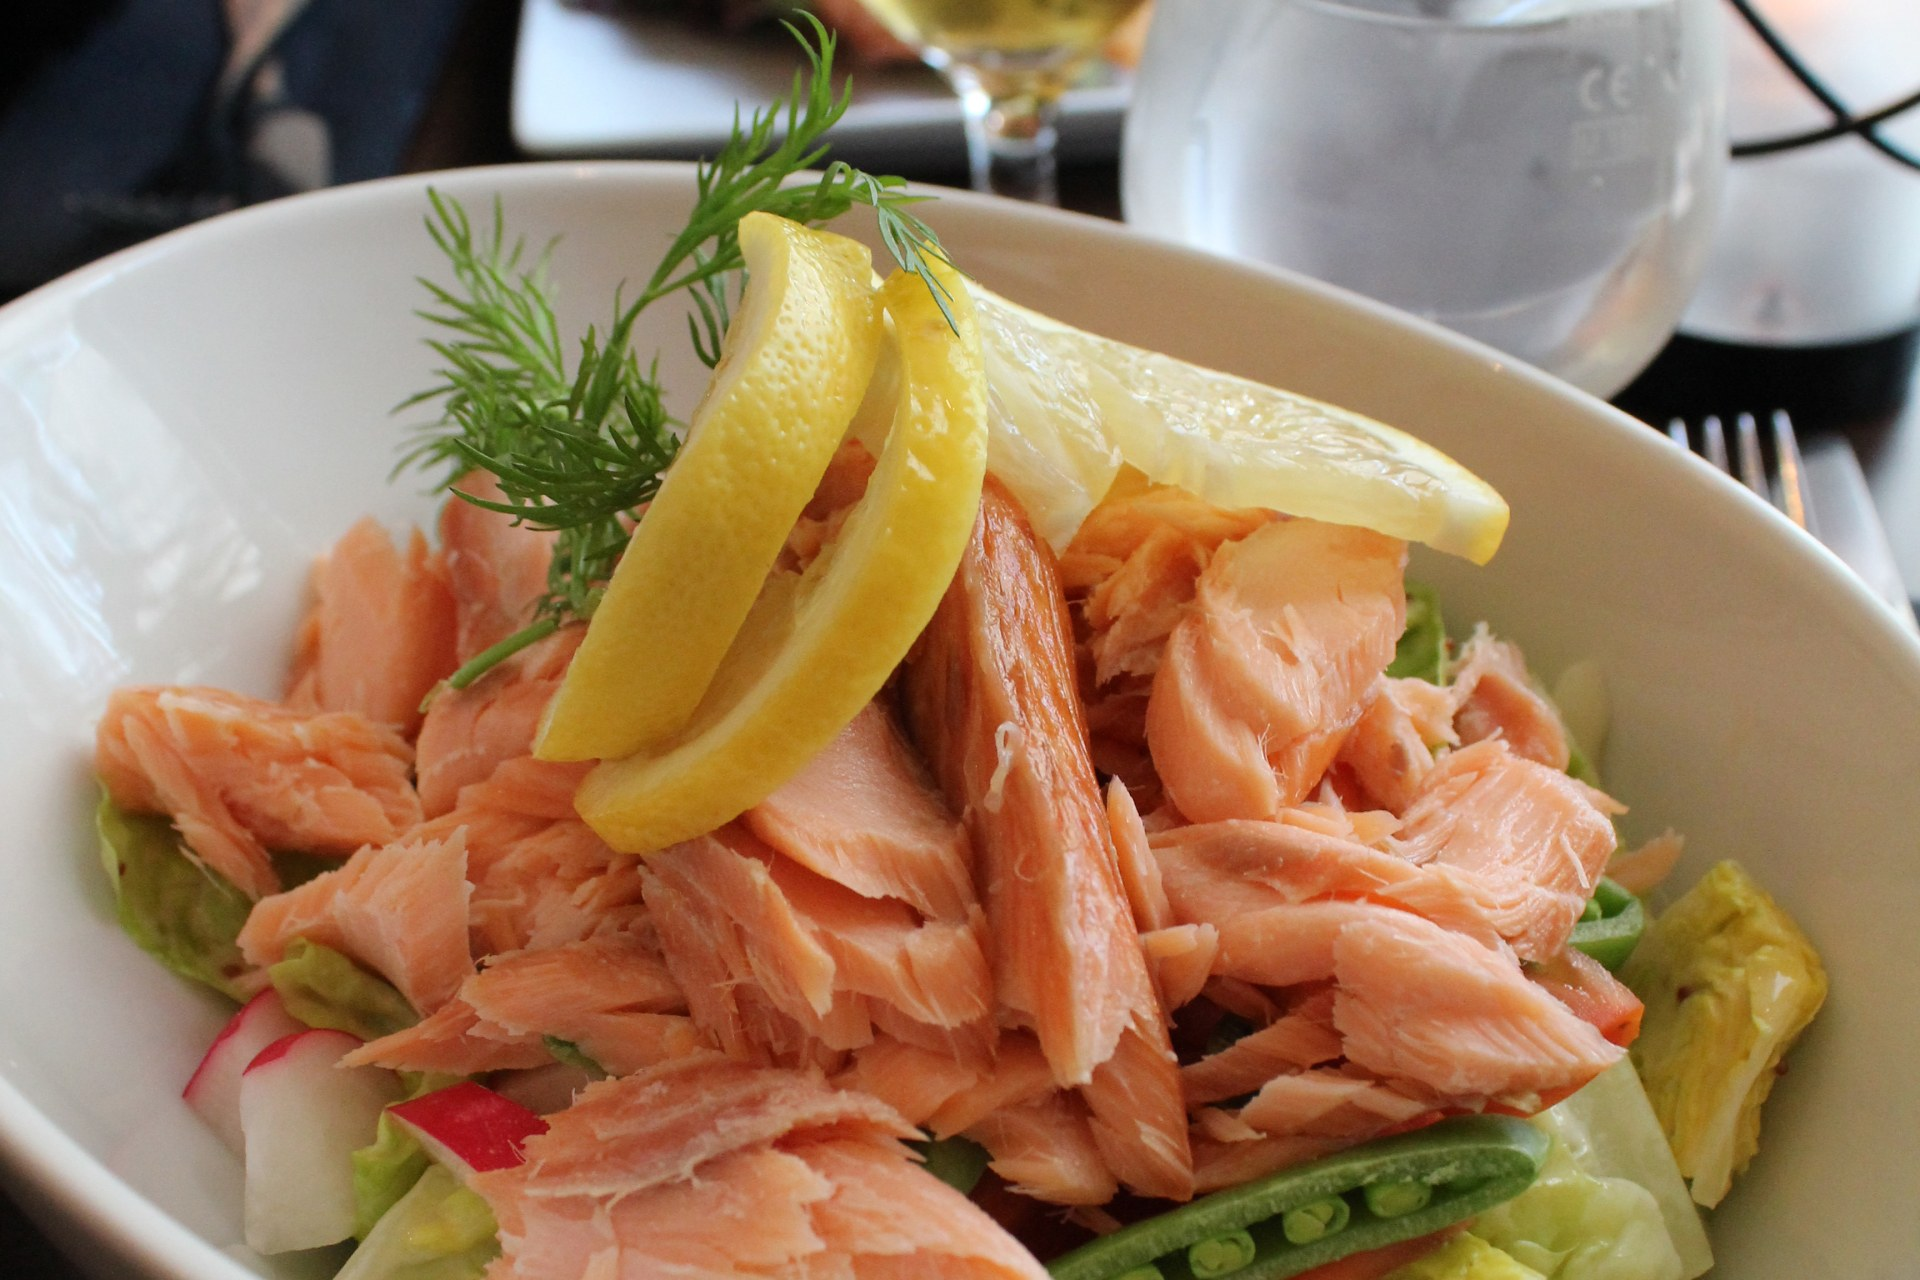 piatti tipici danesi insalata di salmone helsingor